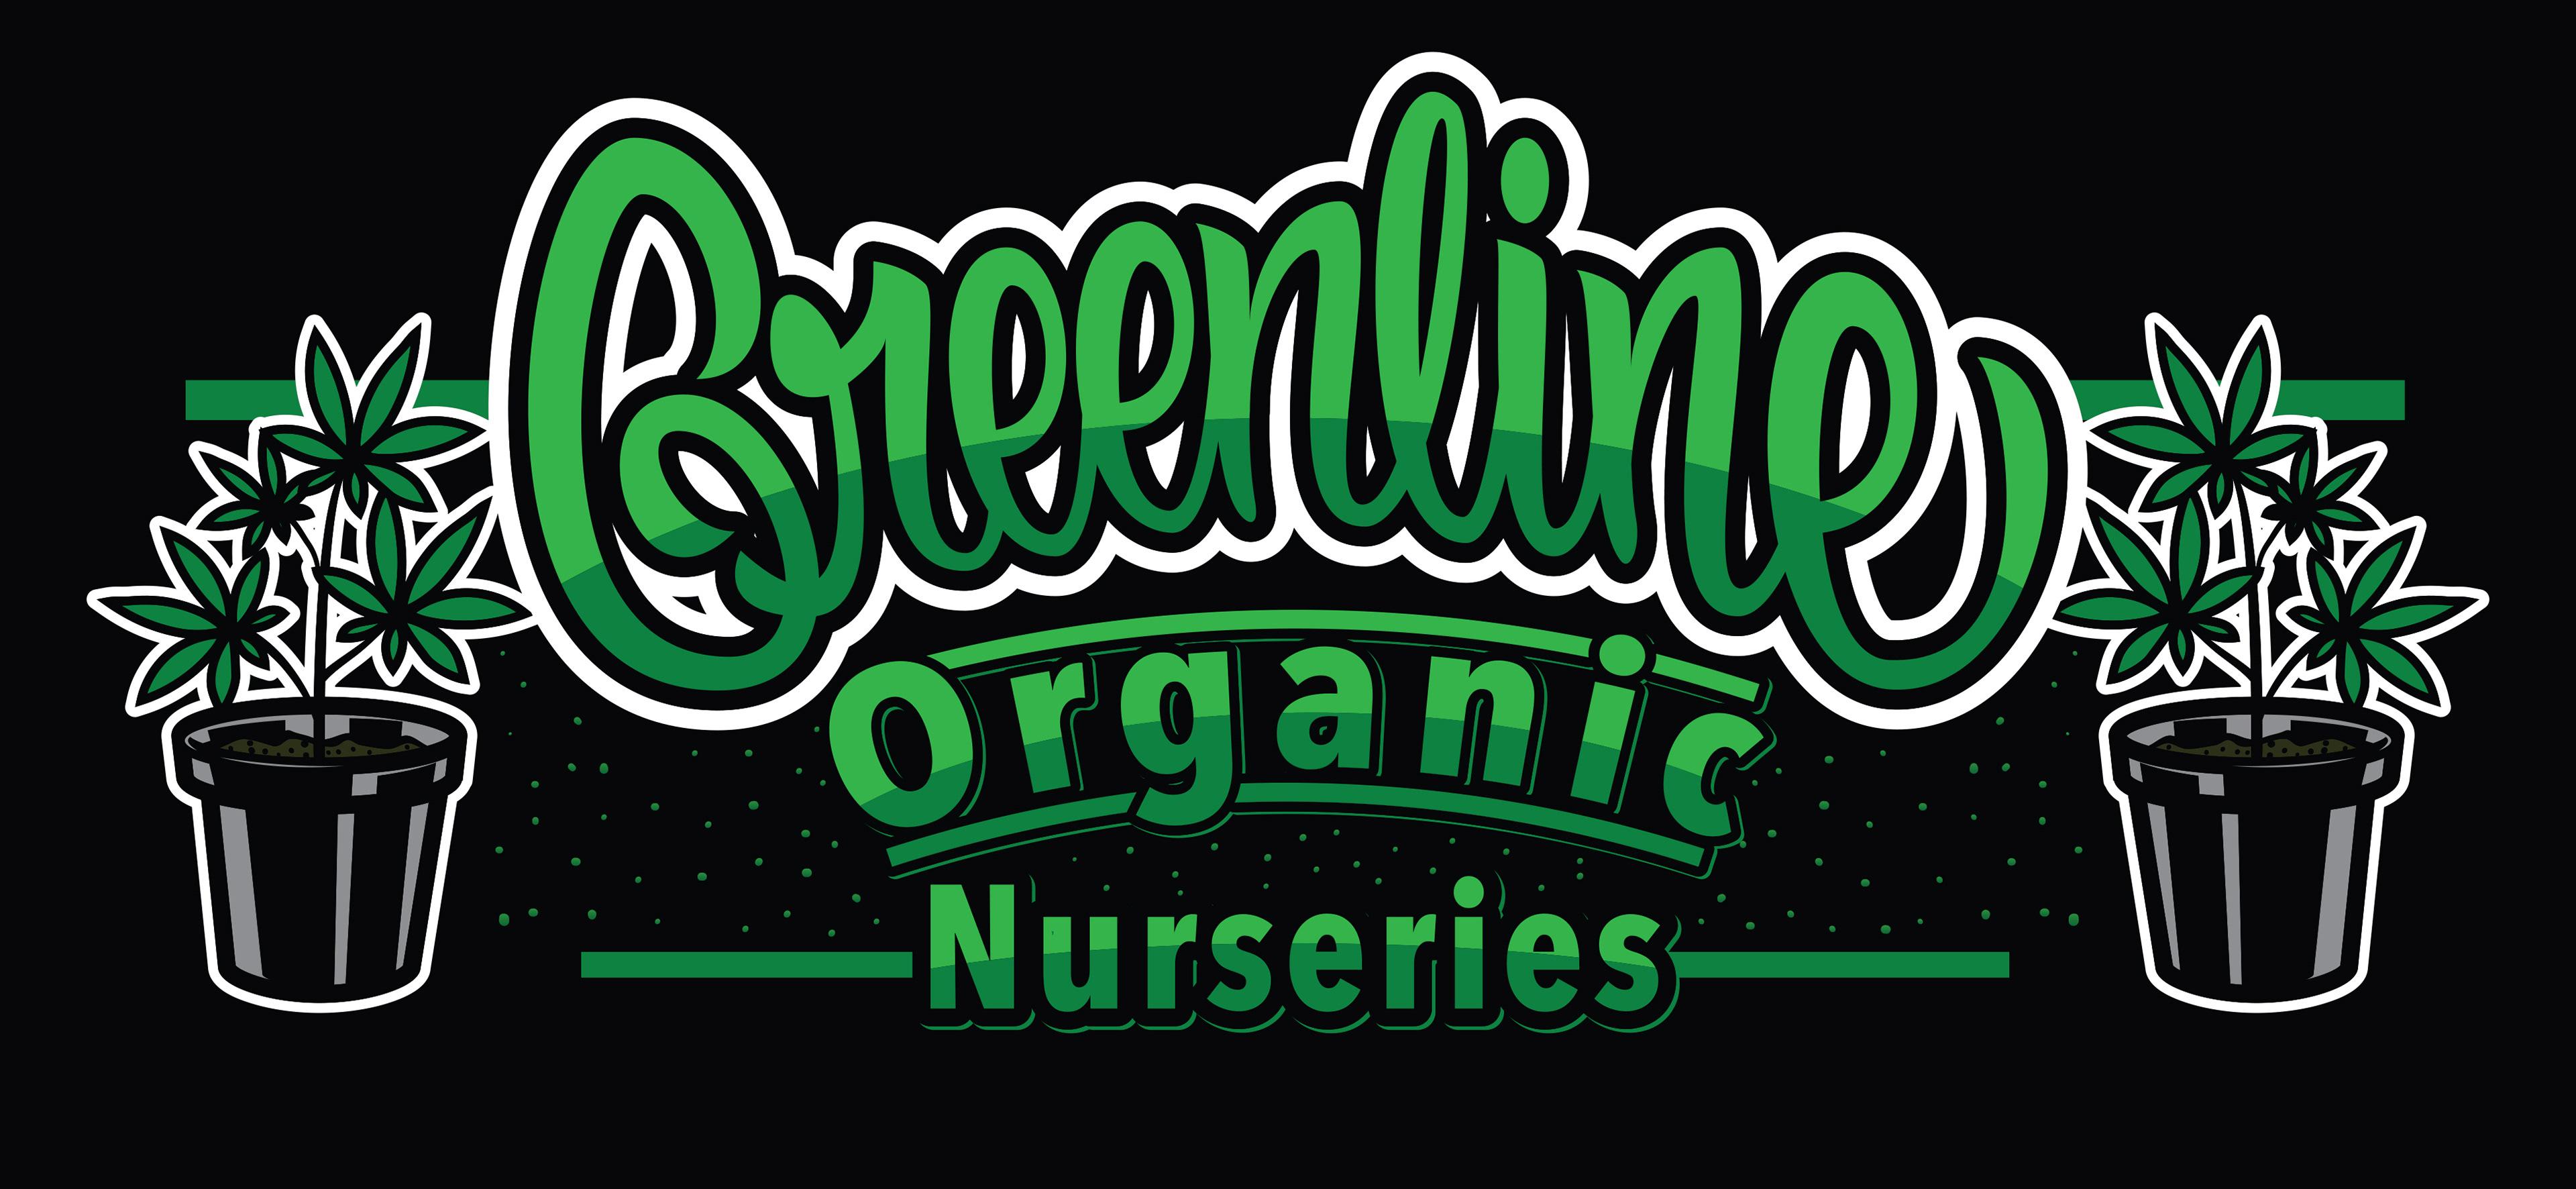 Greenline Organic Nurseries